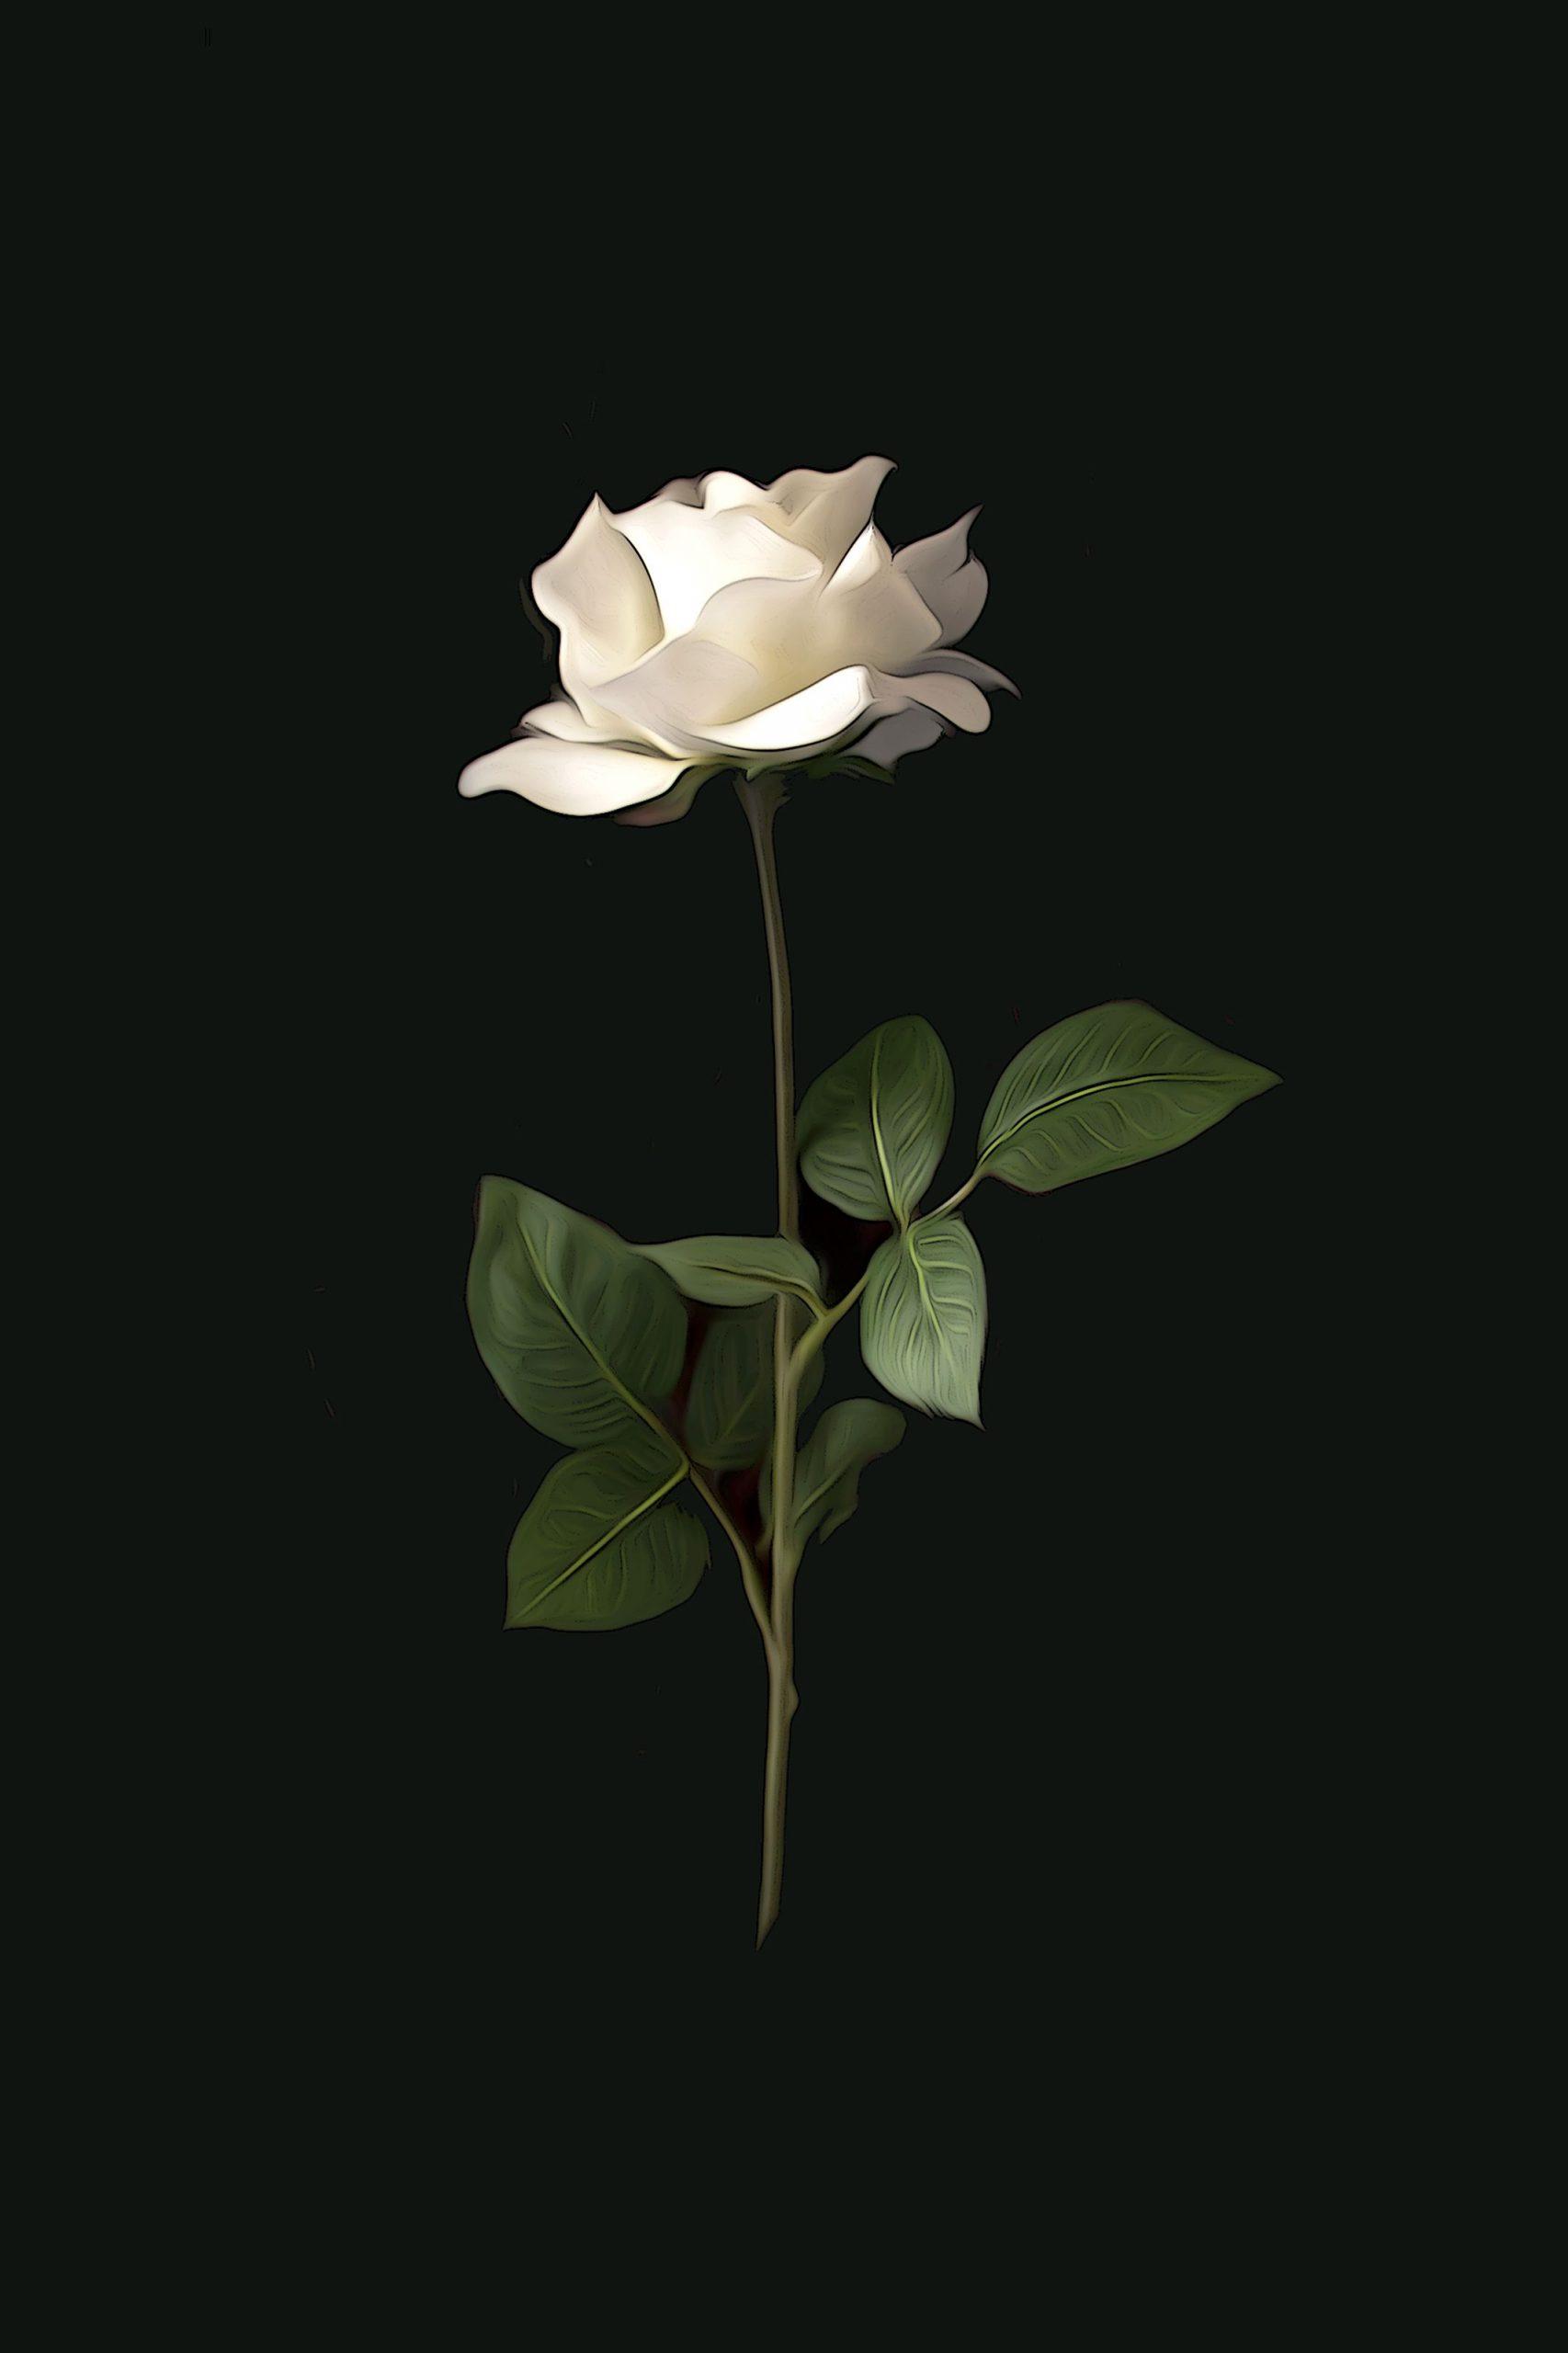 beautiful White Rose Wallpaper